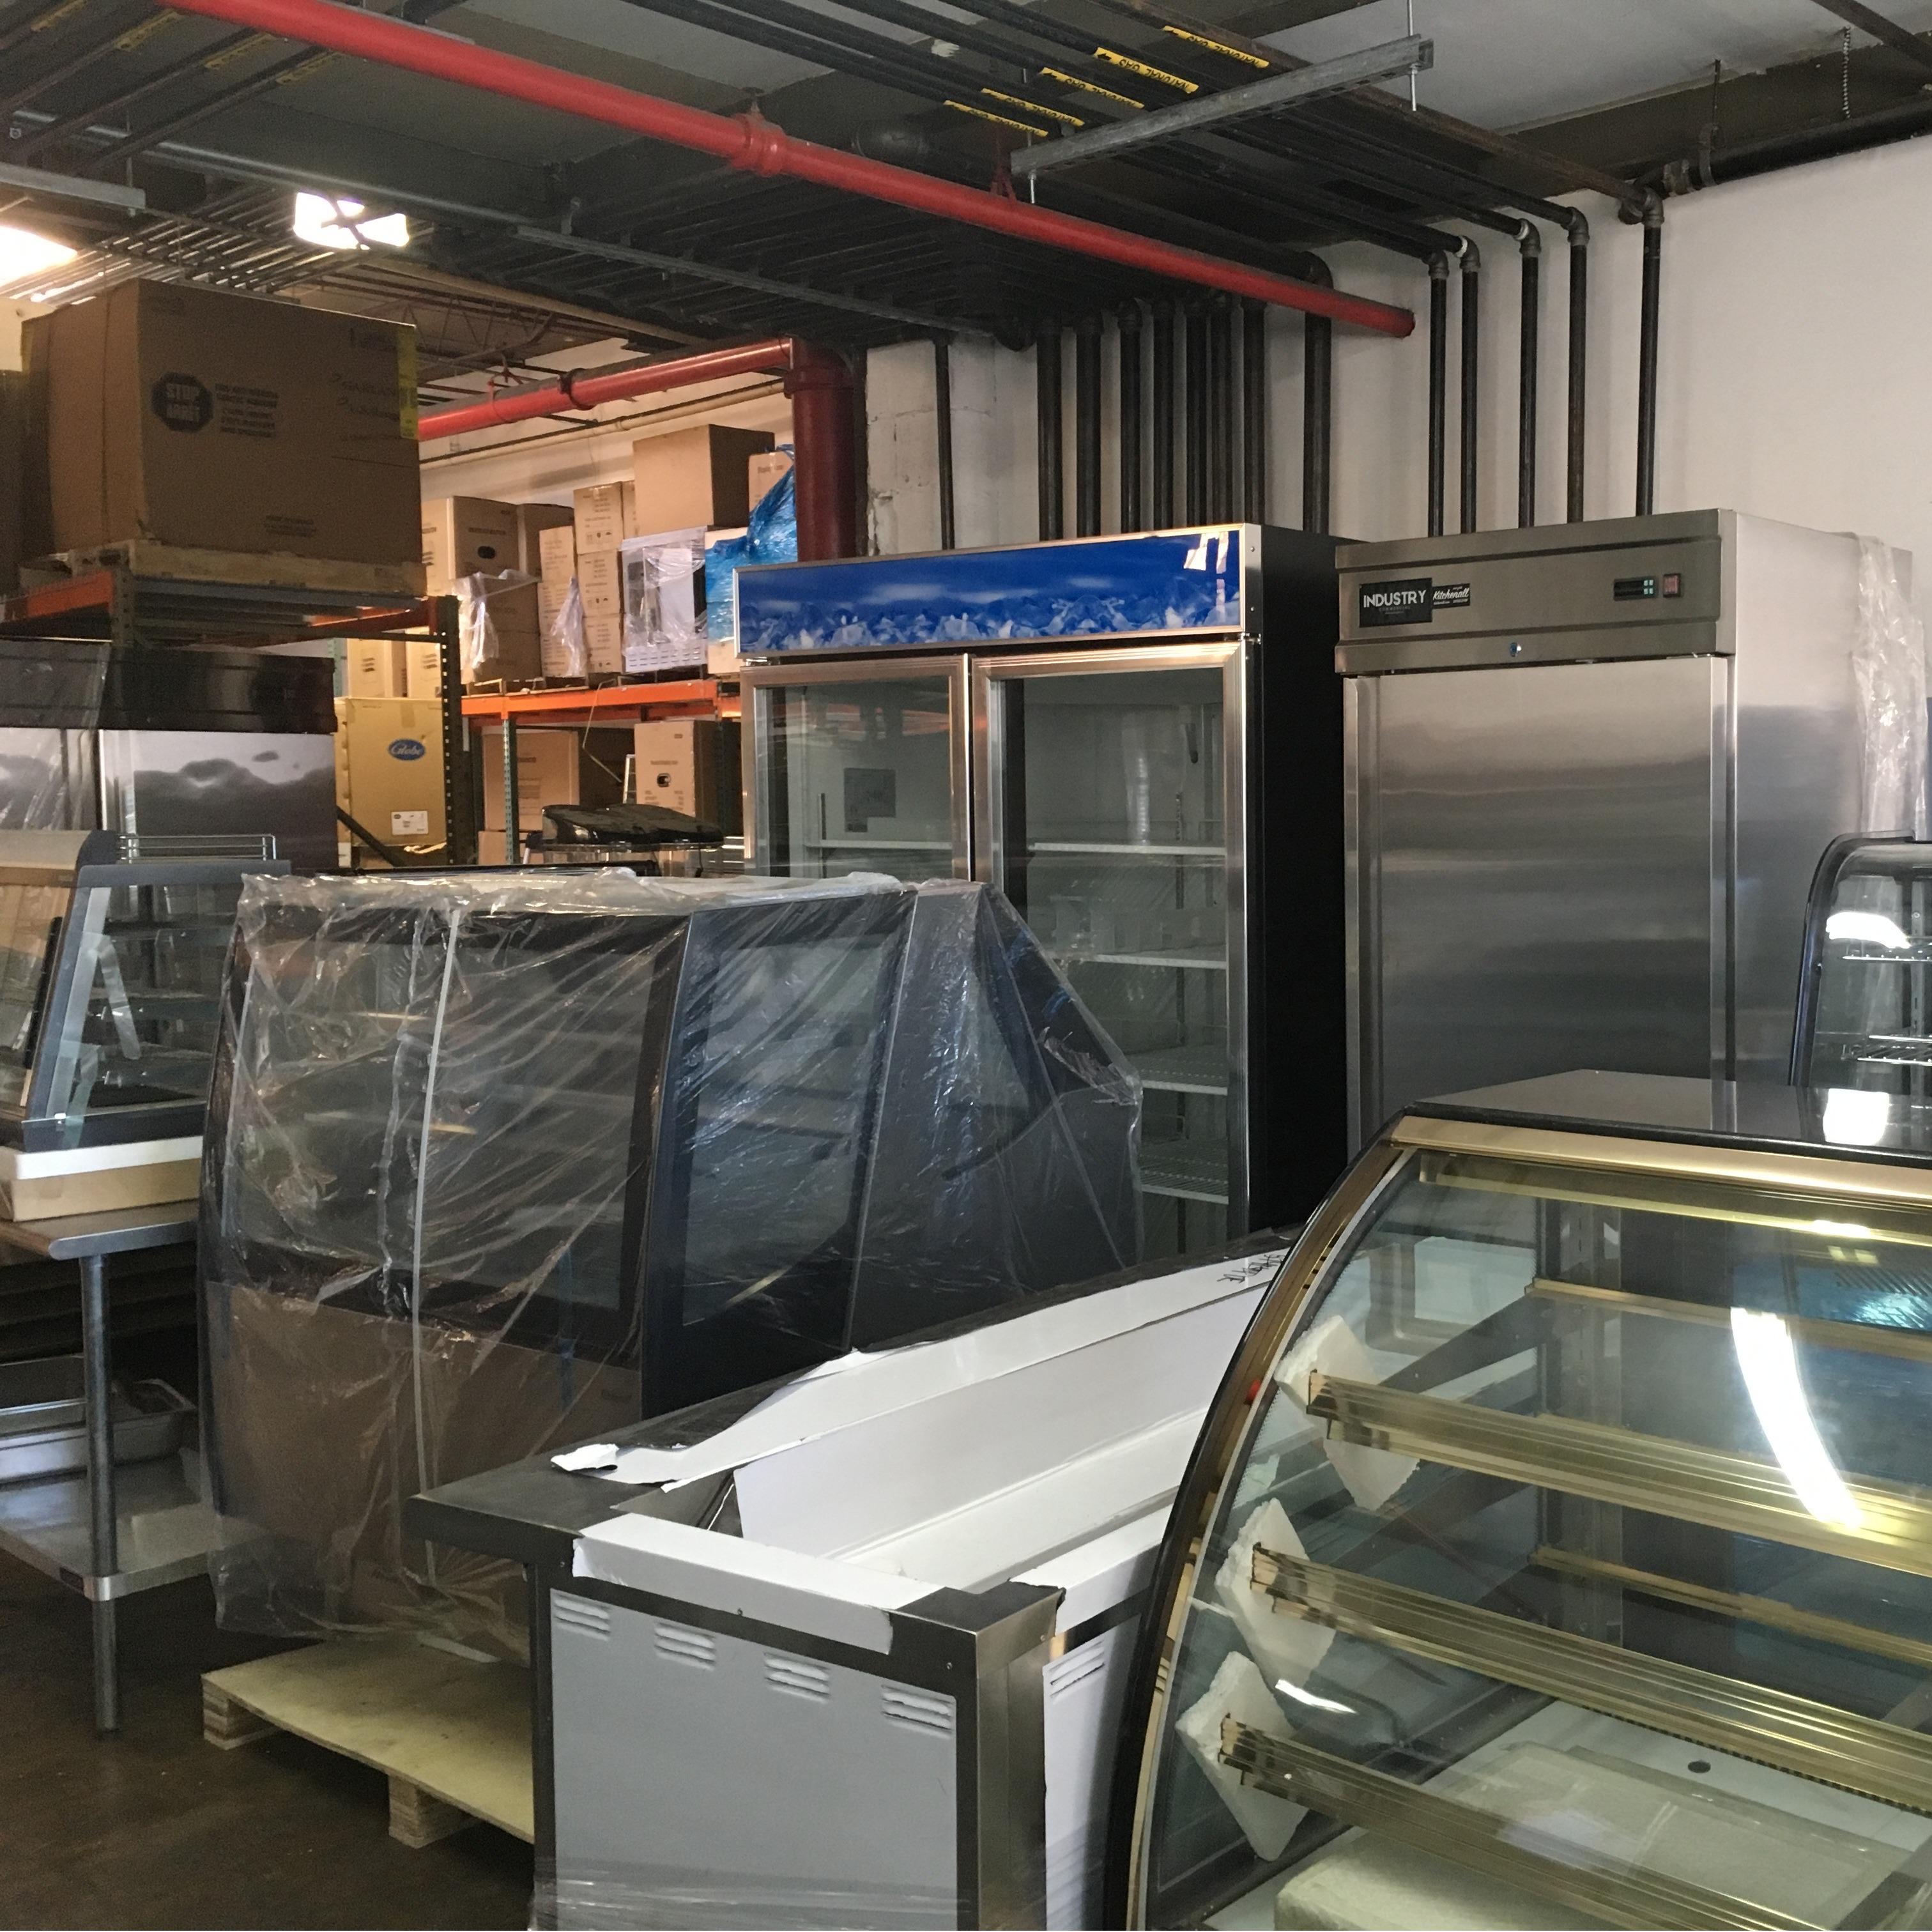 Kitchenall Restaurant Equipment & Supply image 1